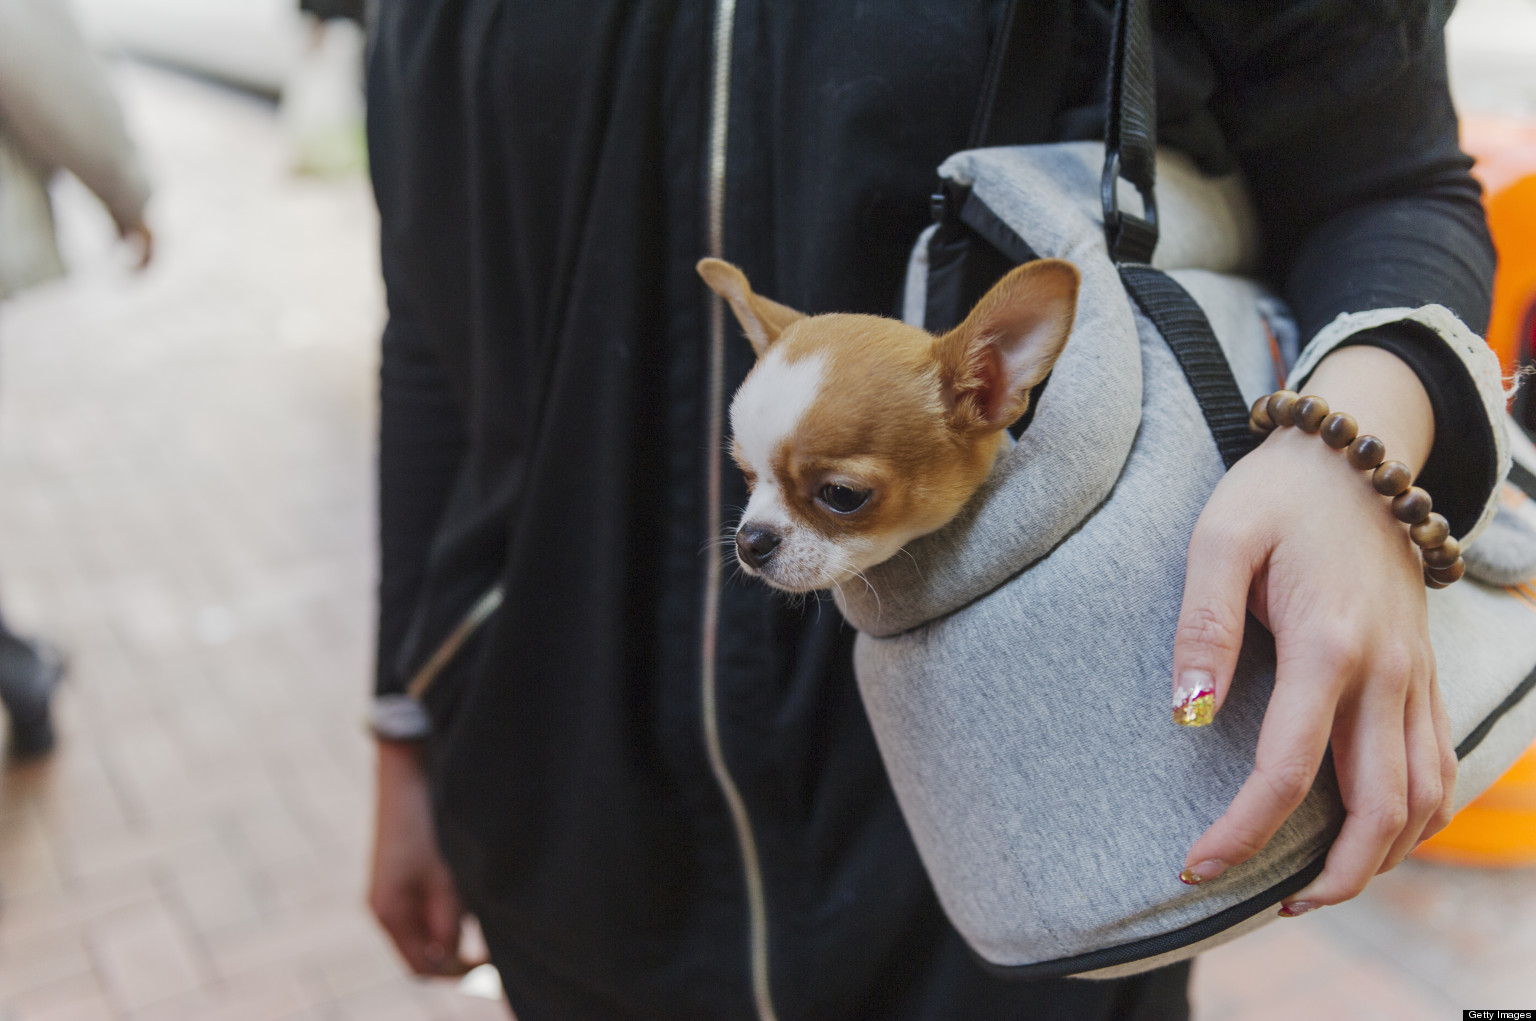 Puppy Lemon Law': Illinois House OKs Consumer Protection Plan As ...